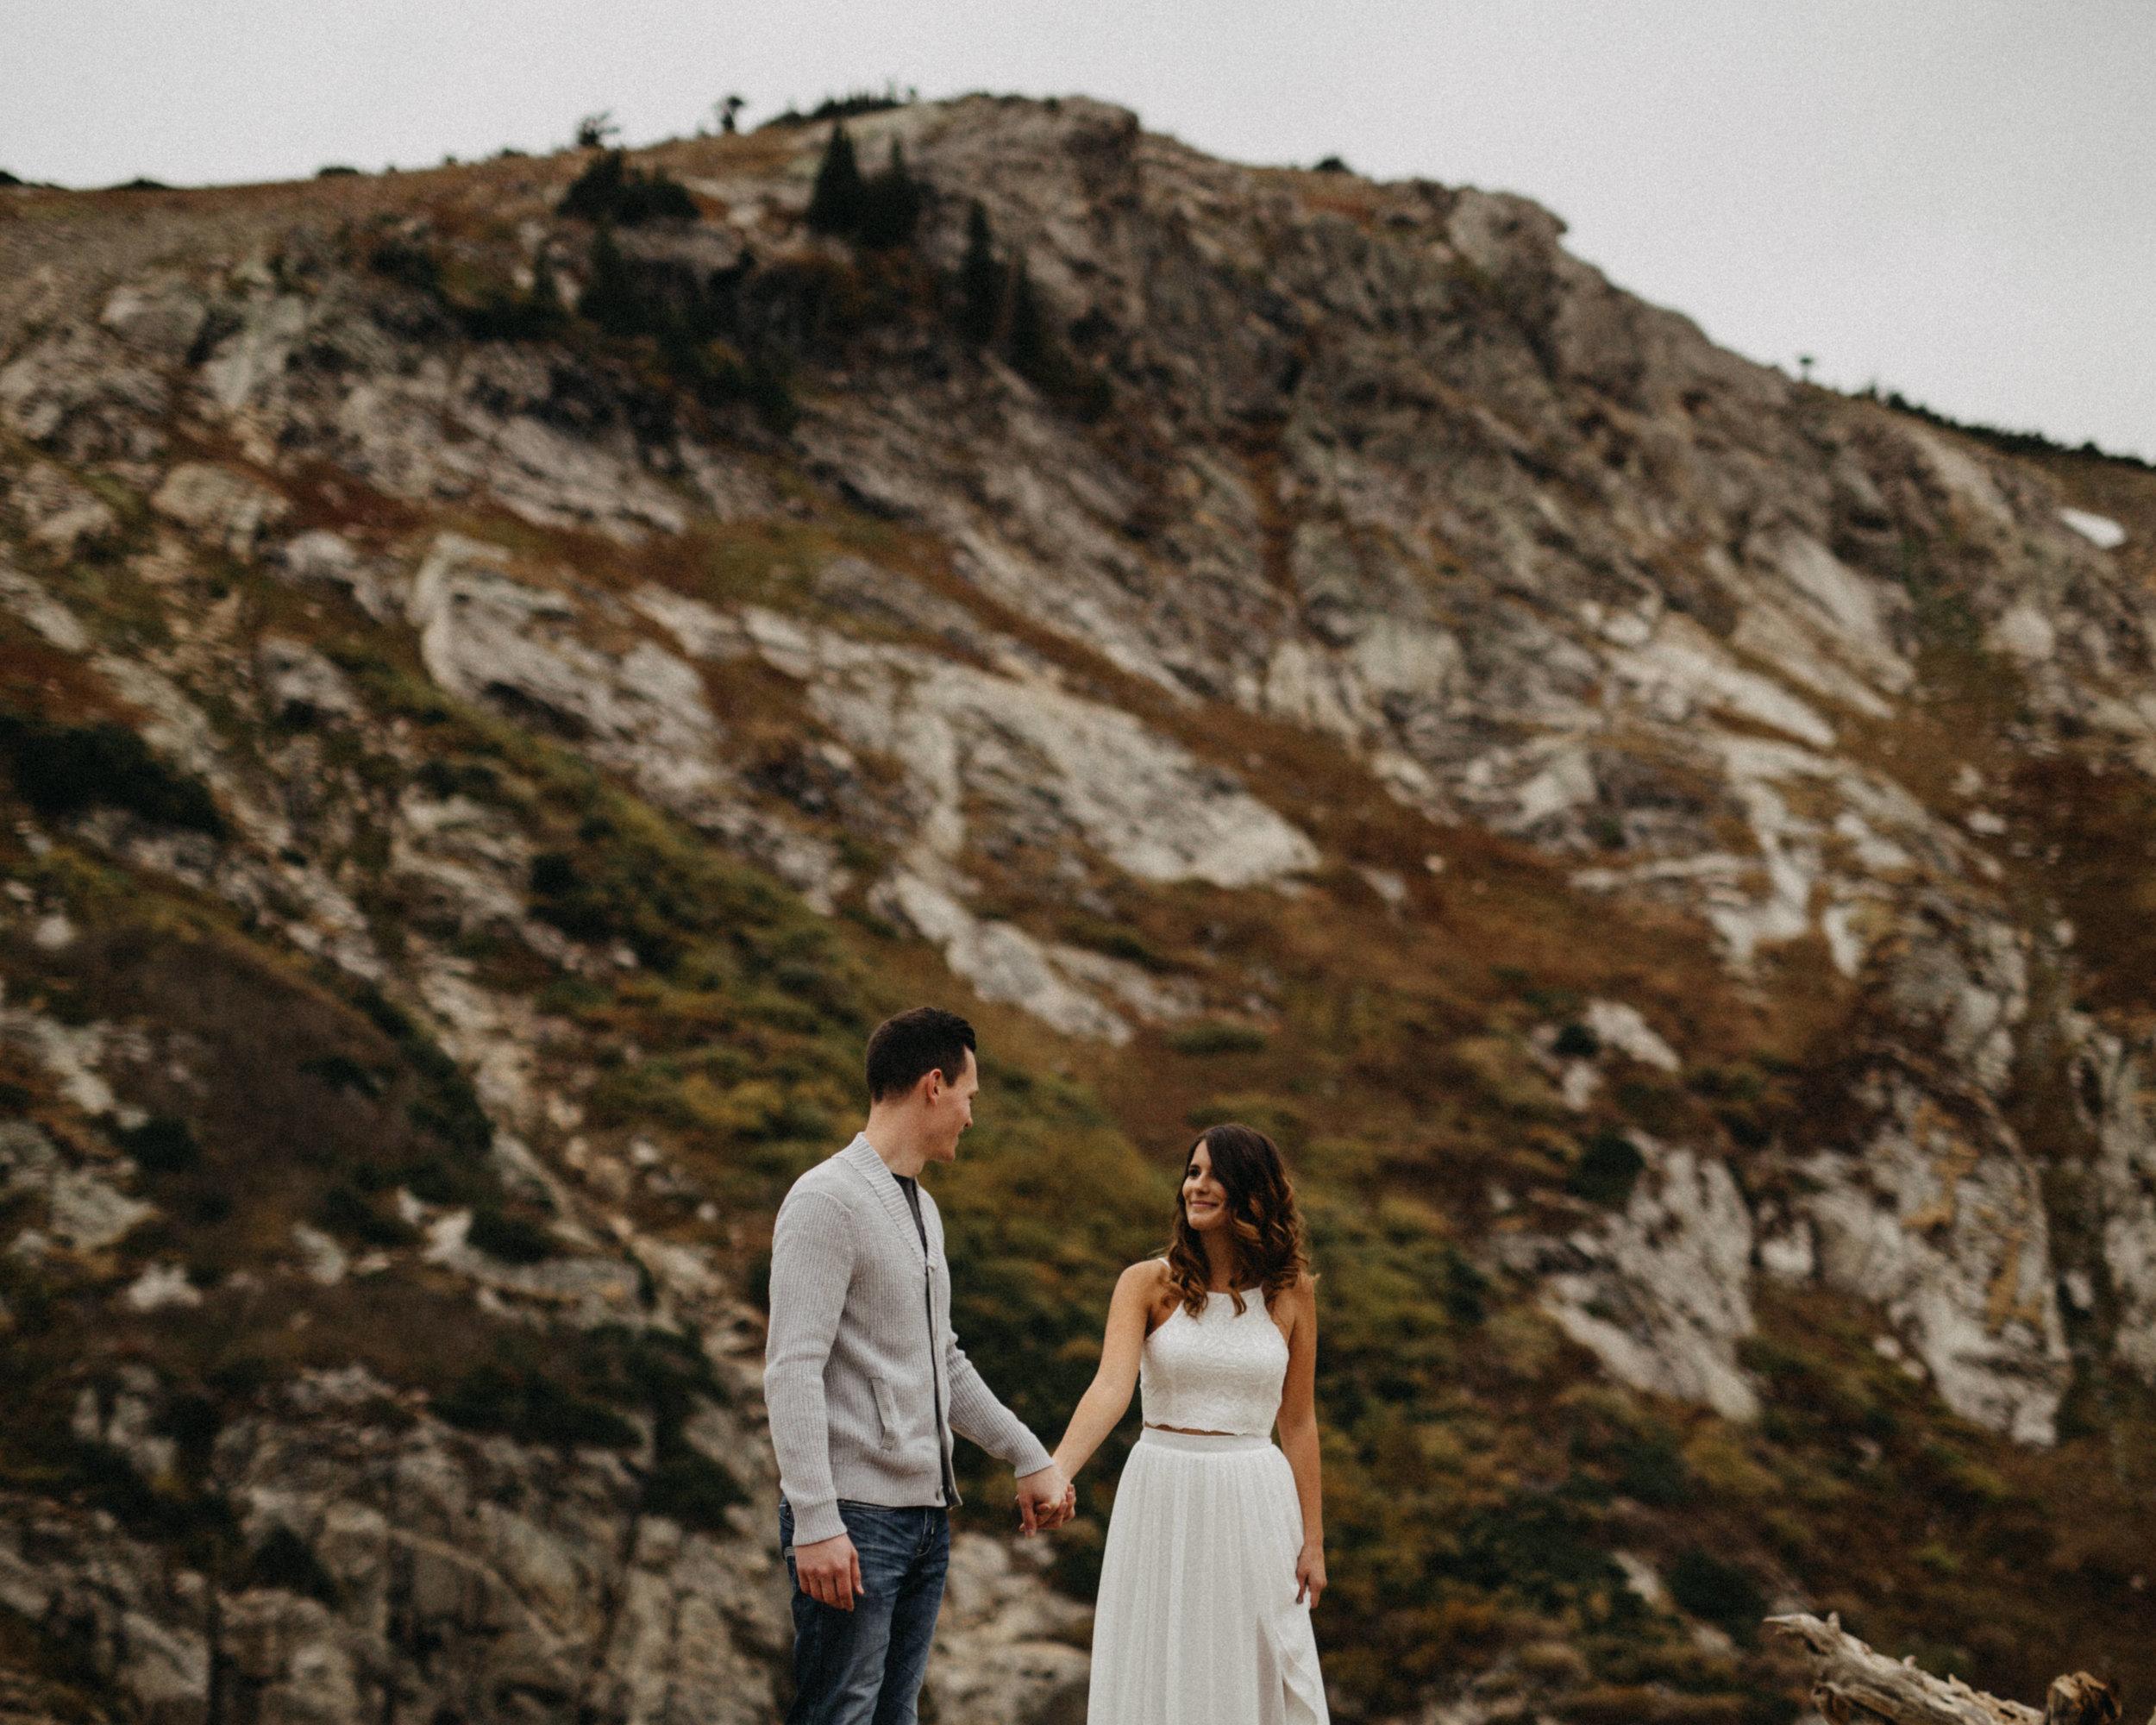 Destination wedding photographers in Colorado, Rocky Mountains